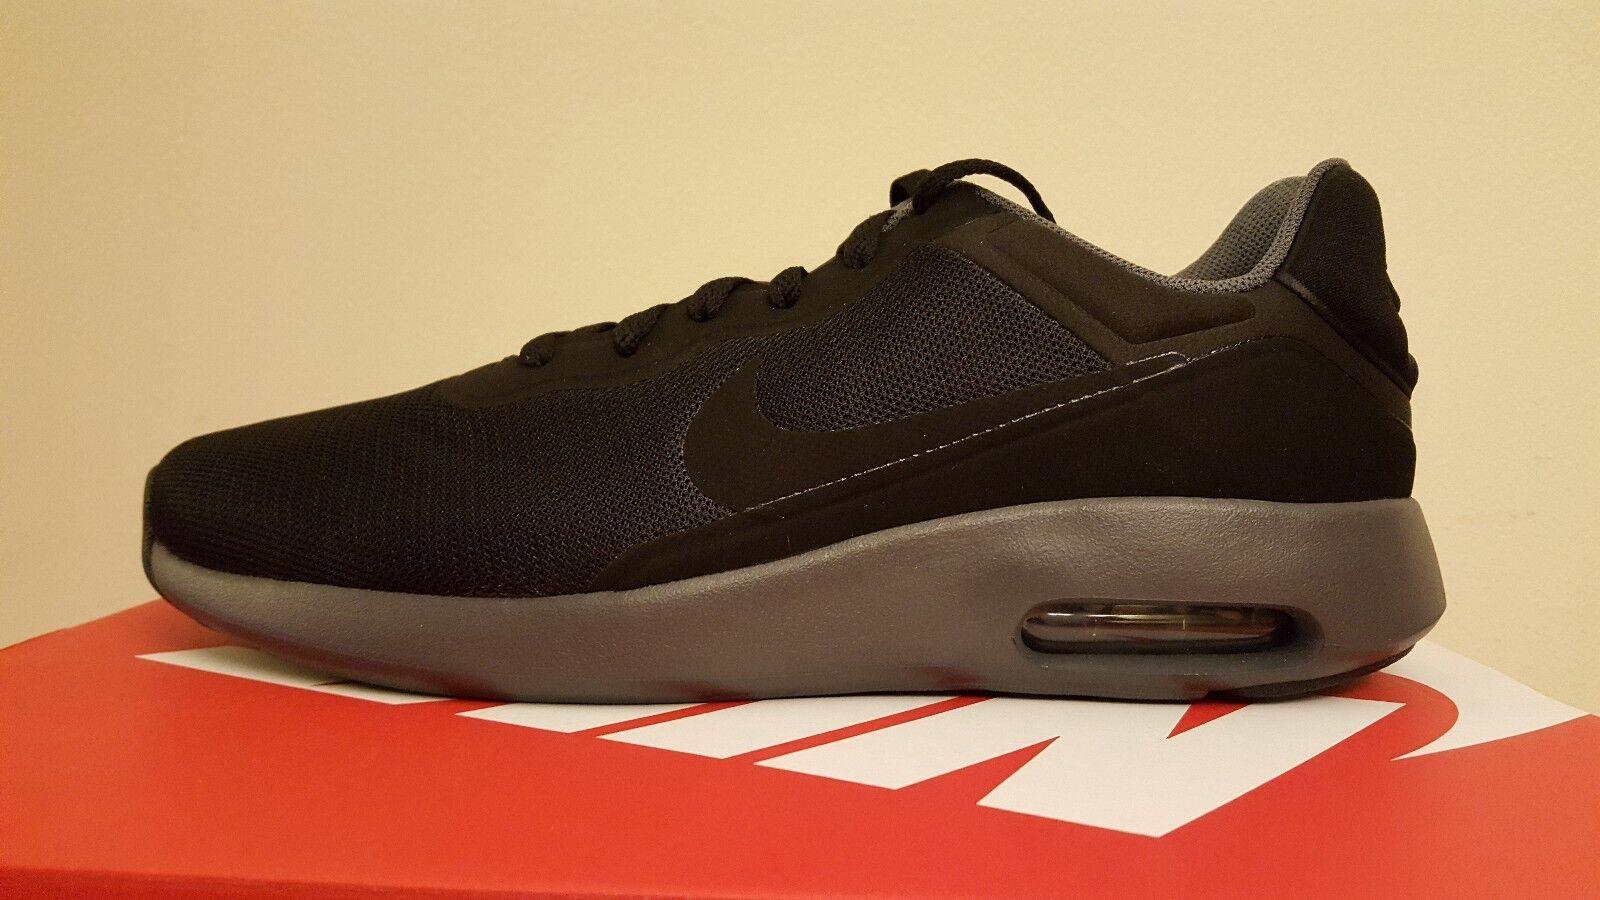 Nike Air Max Modern Essential Men's Running shoes Black Grey (844874 003)